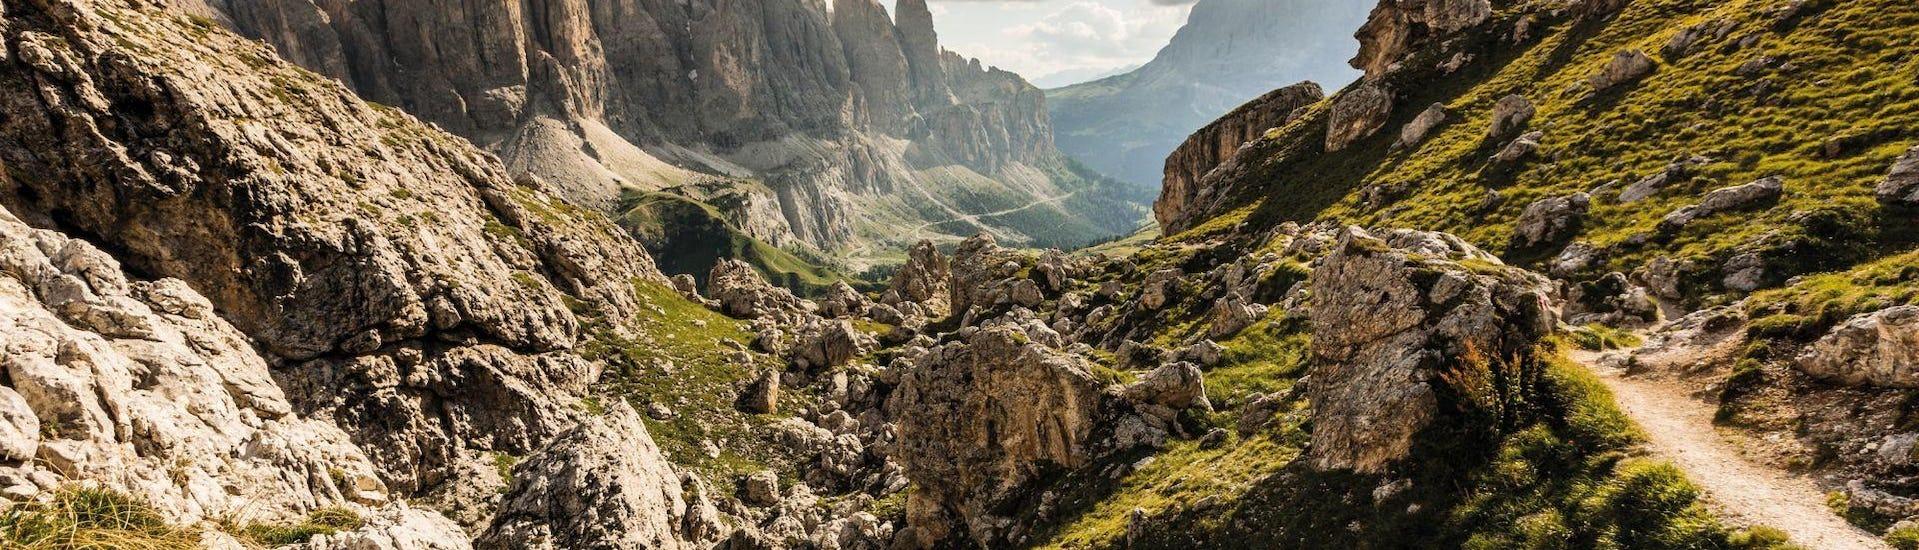 E-Mountain Bike Tour in Selva di Val Gardena - Intermediate